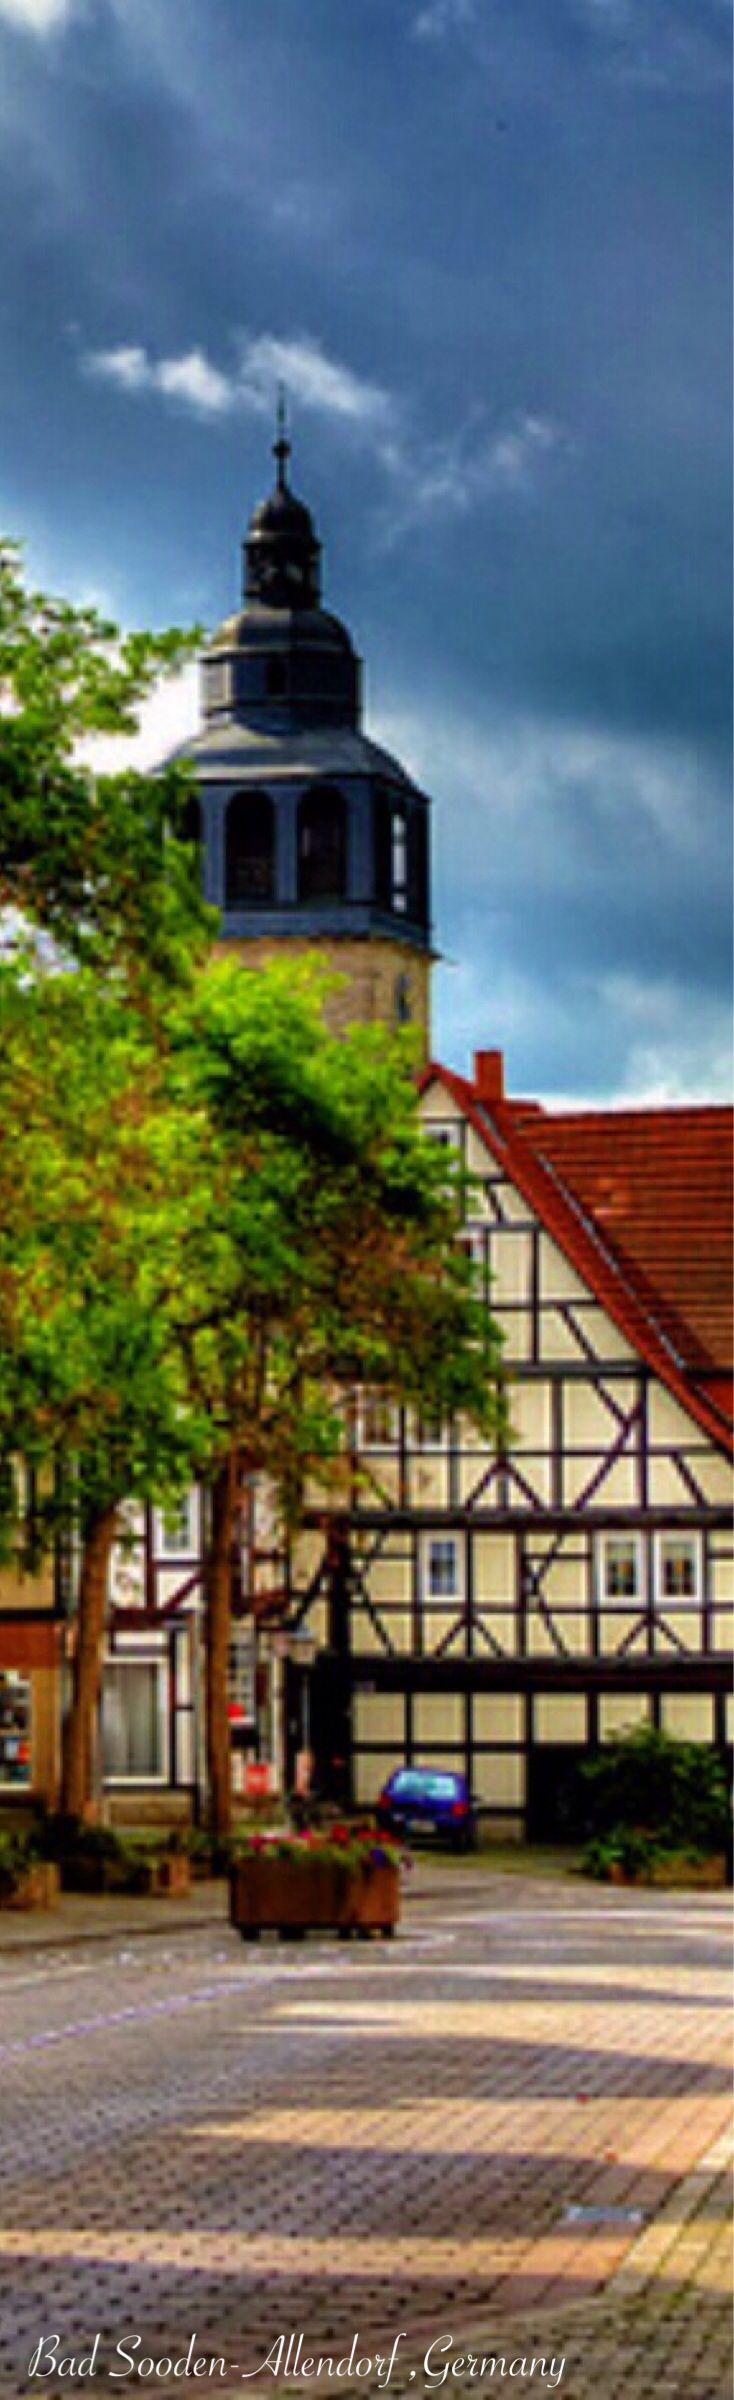 Allendorf City